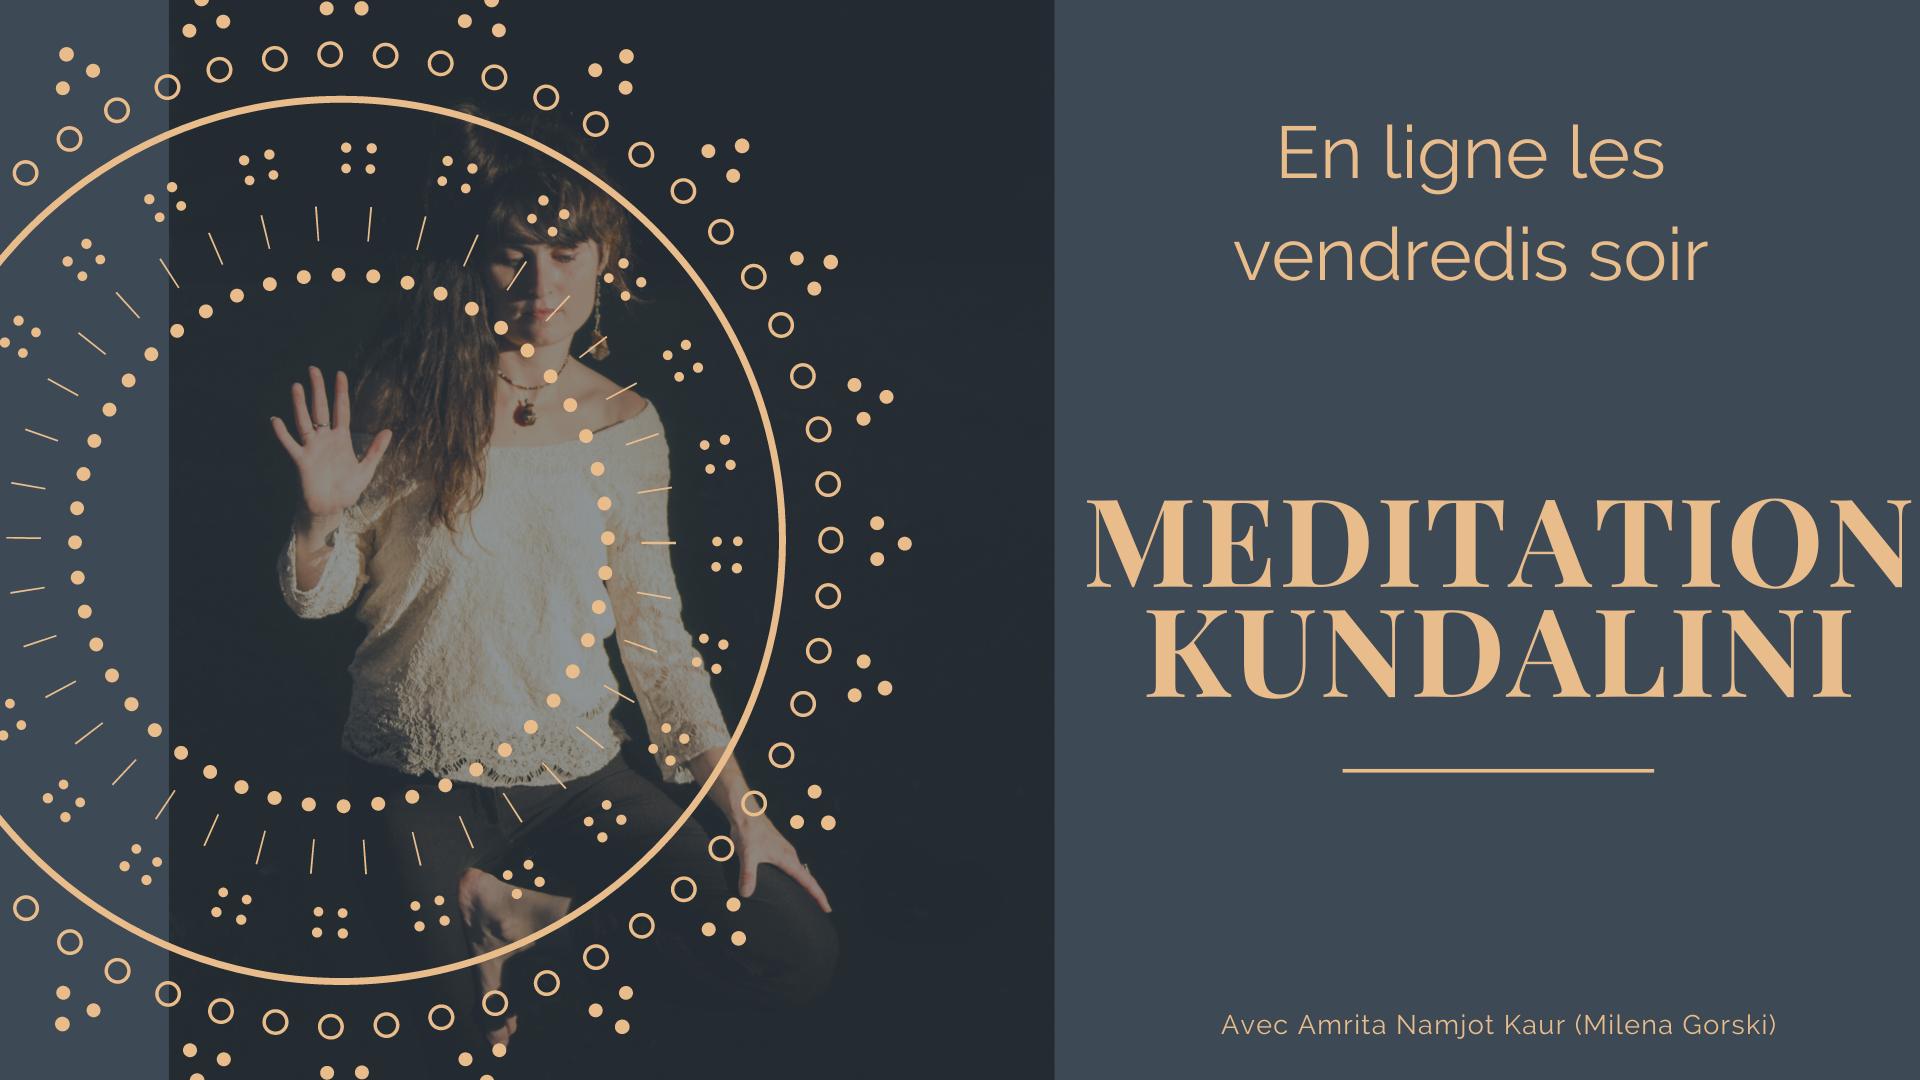 Méditation Kundalini en ligne